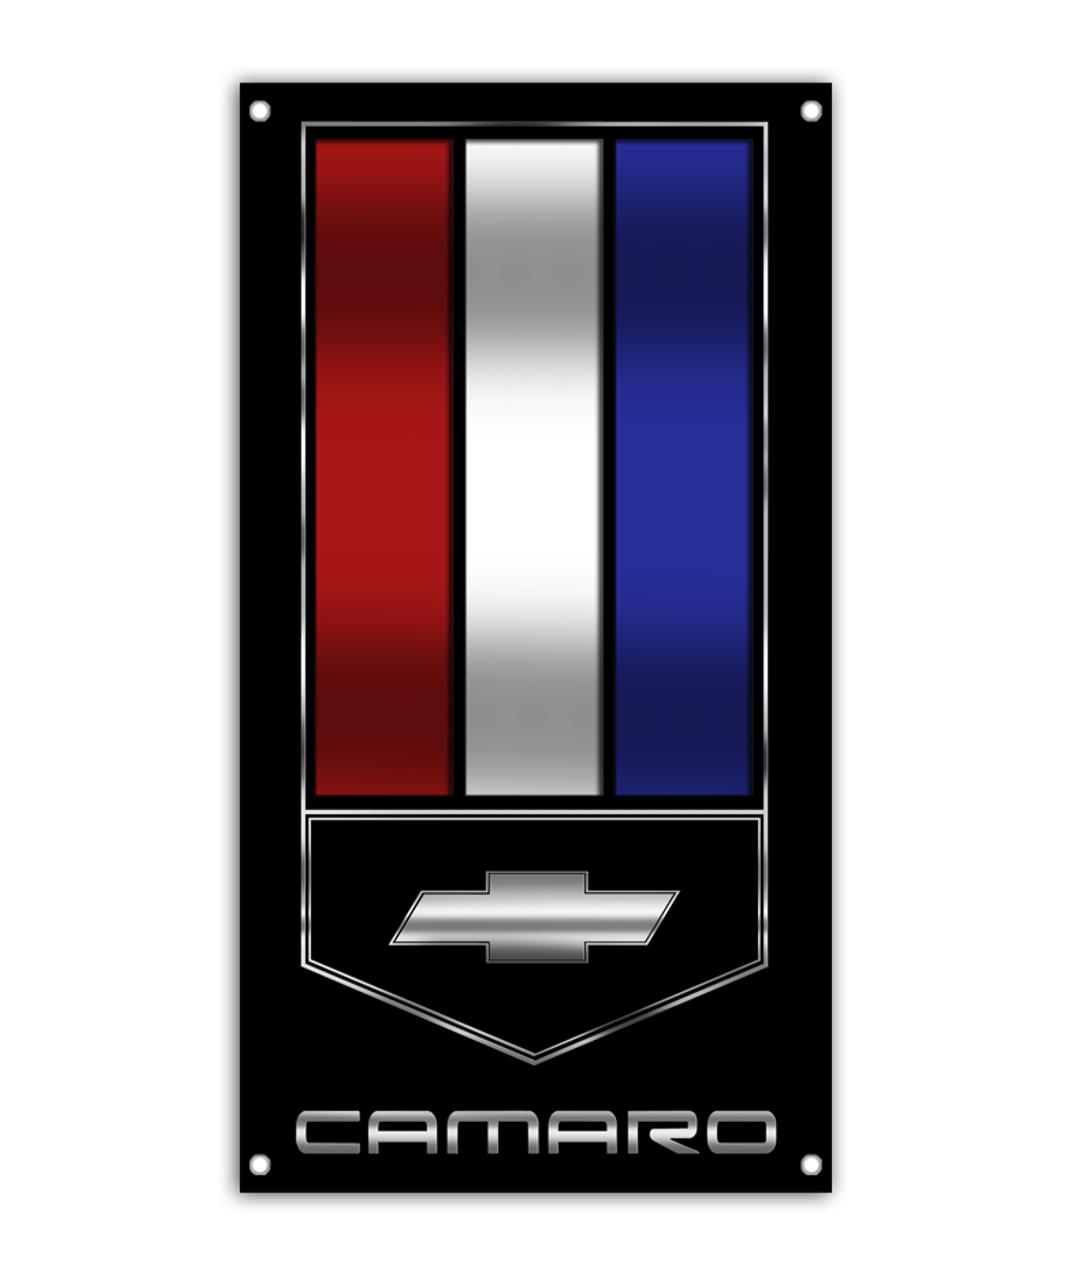 Camaro Emblem Banner Aftershock Decals